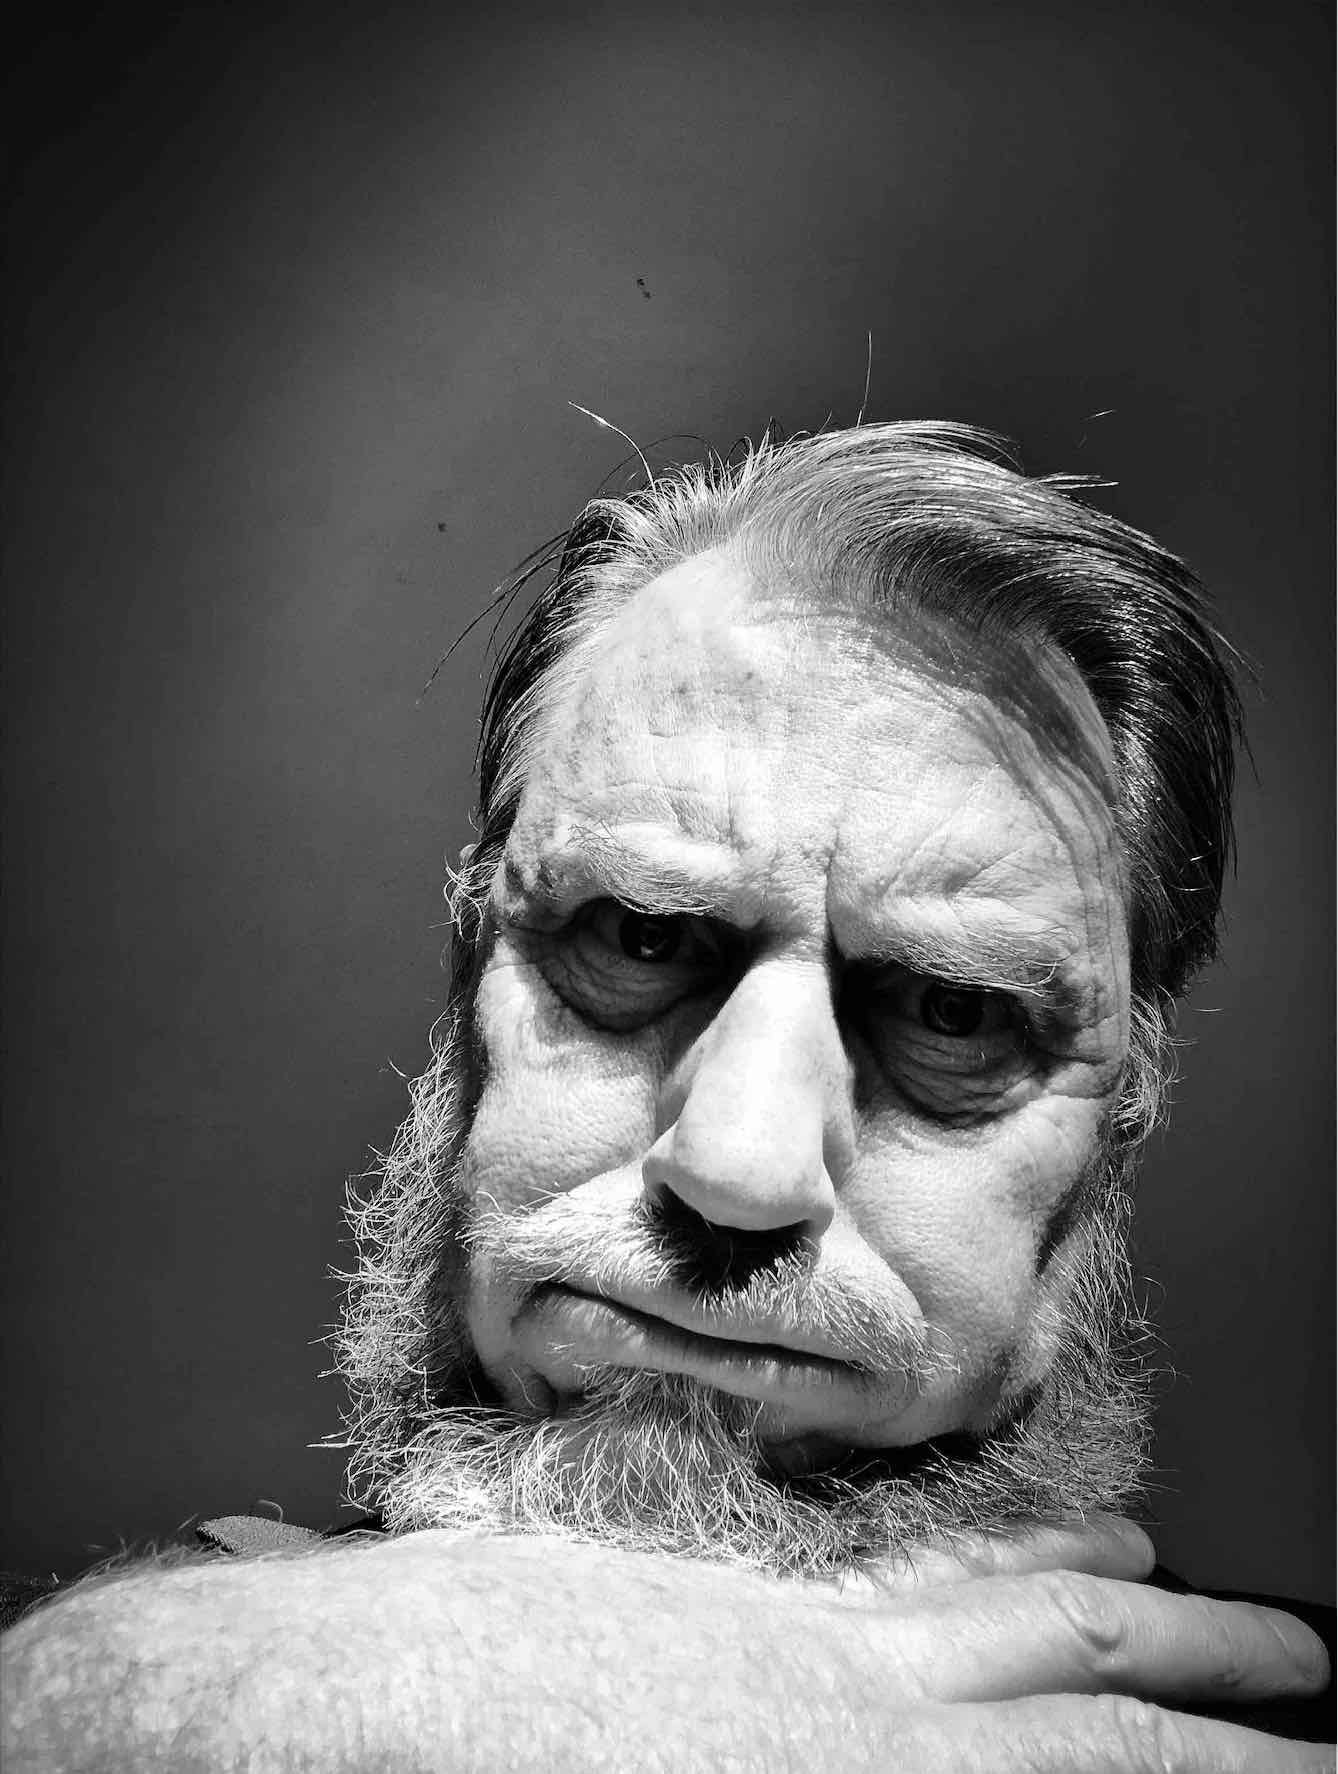 Et Tu Brute?  Persona Portrait, 2018  Copyright © Tennyson Woodbridge, 1963 to present